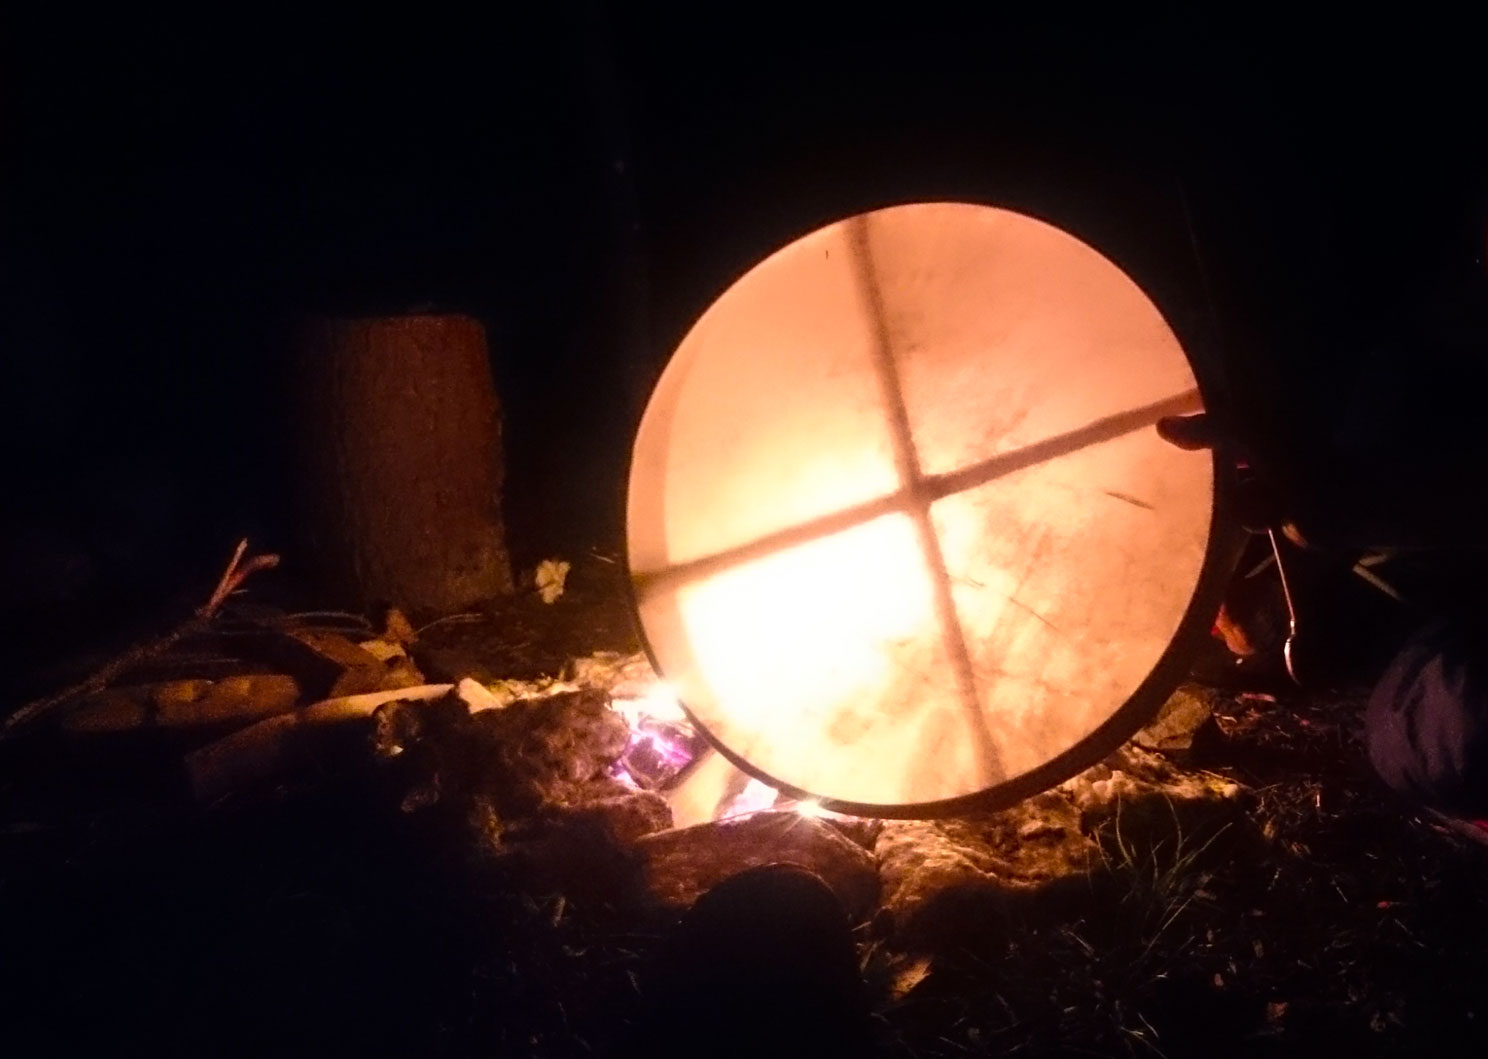 Wildnispaedagogik Weiterbildung Ritualarbeit